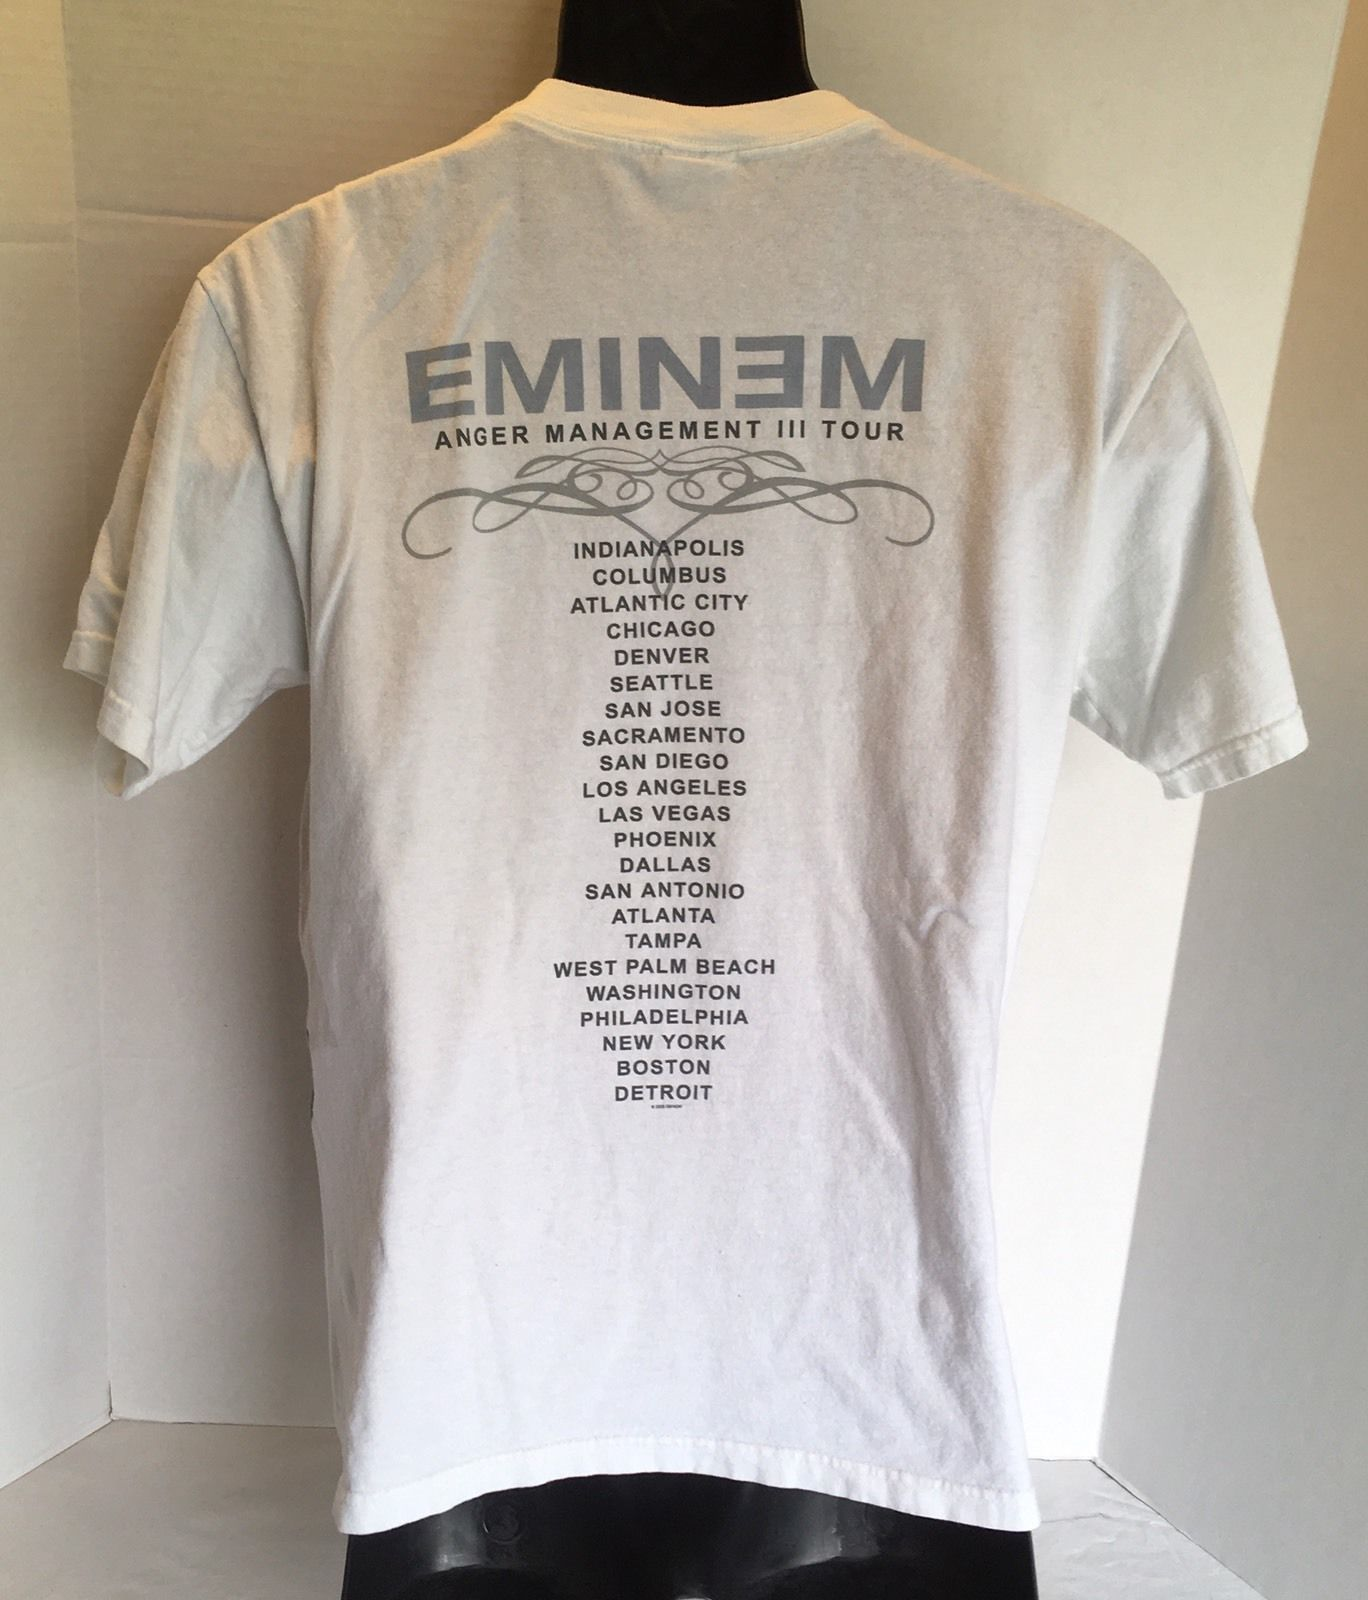 EMINEM 2005 Concert T Shirt Anger Management III Tour White Size Small Rap